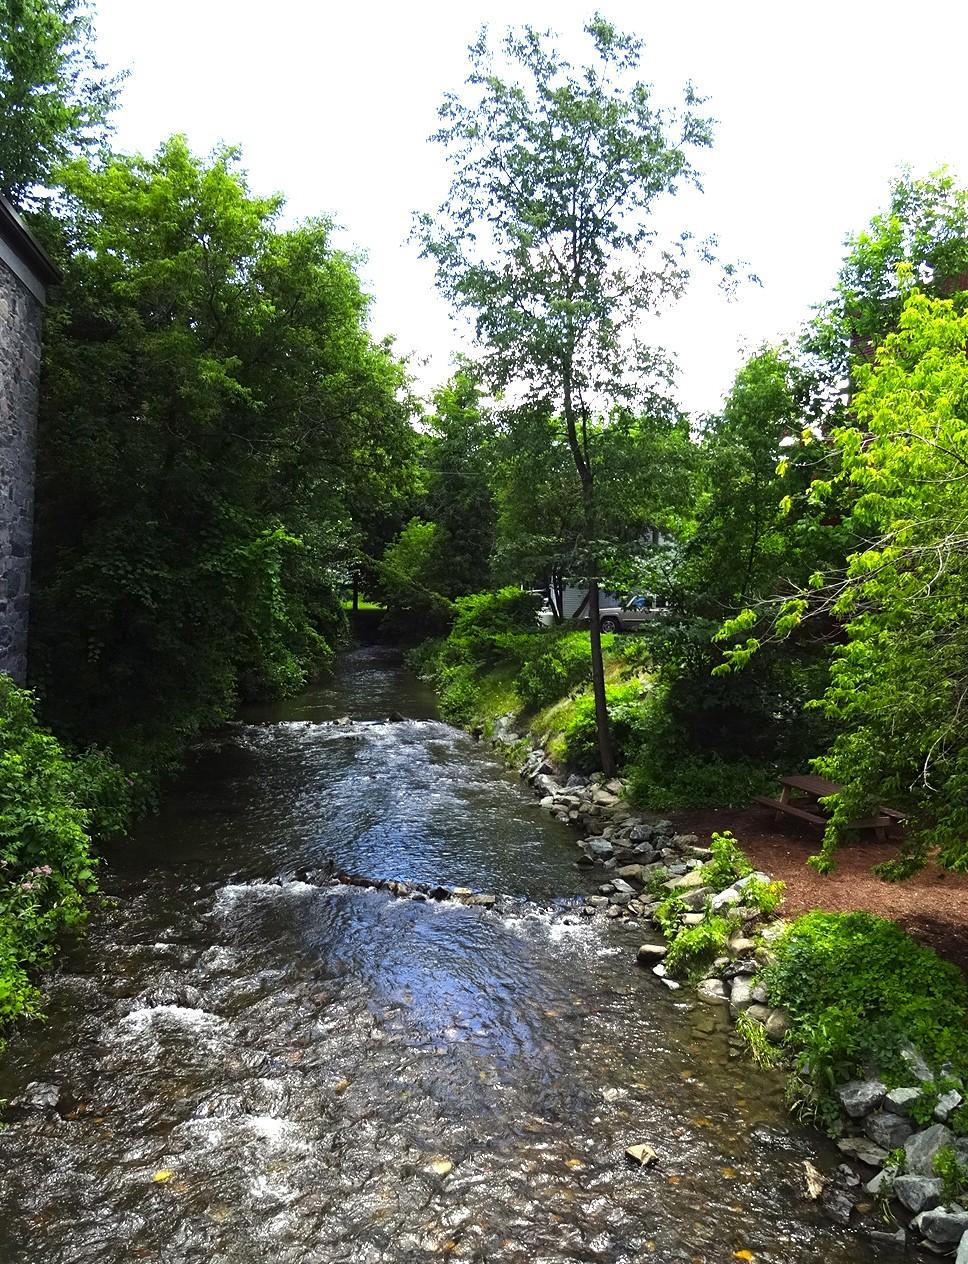 woodstock, vermont, wanderlust, travel blog, new england